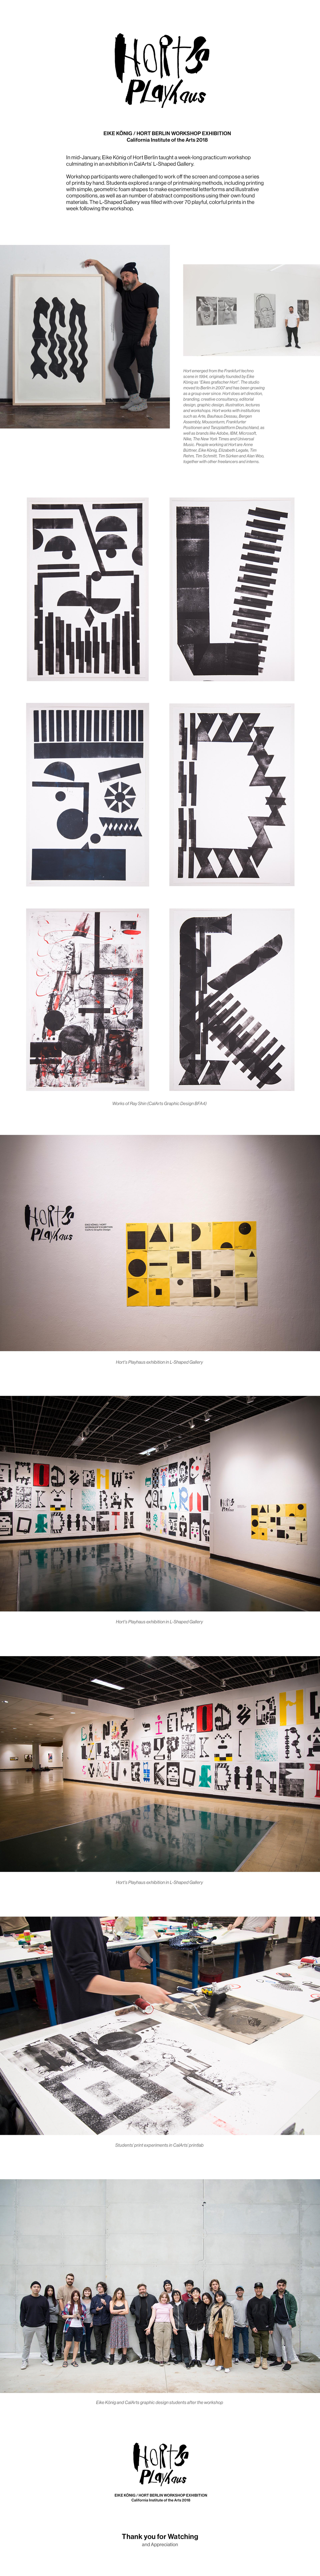 Design 54 Berlin shin graphic designer eike könig hort berlin workshop